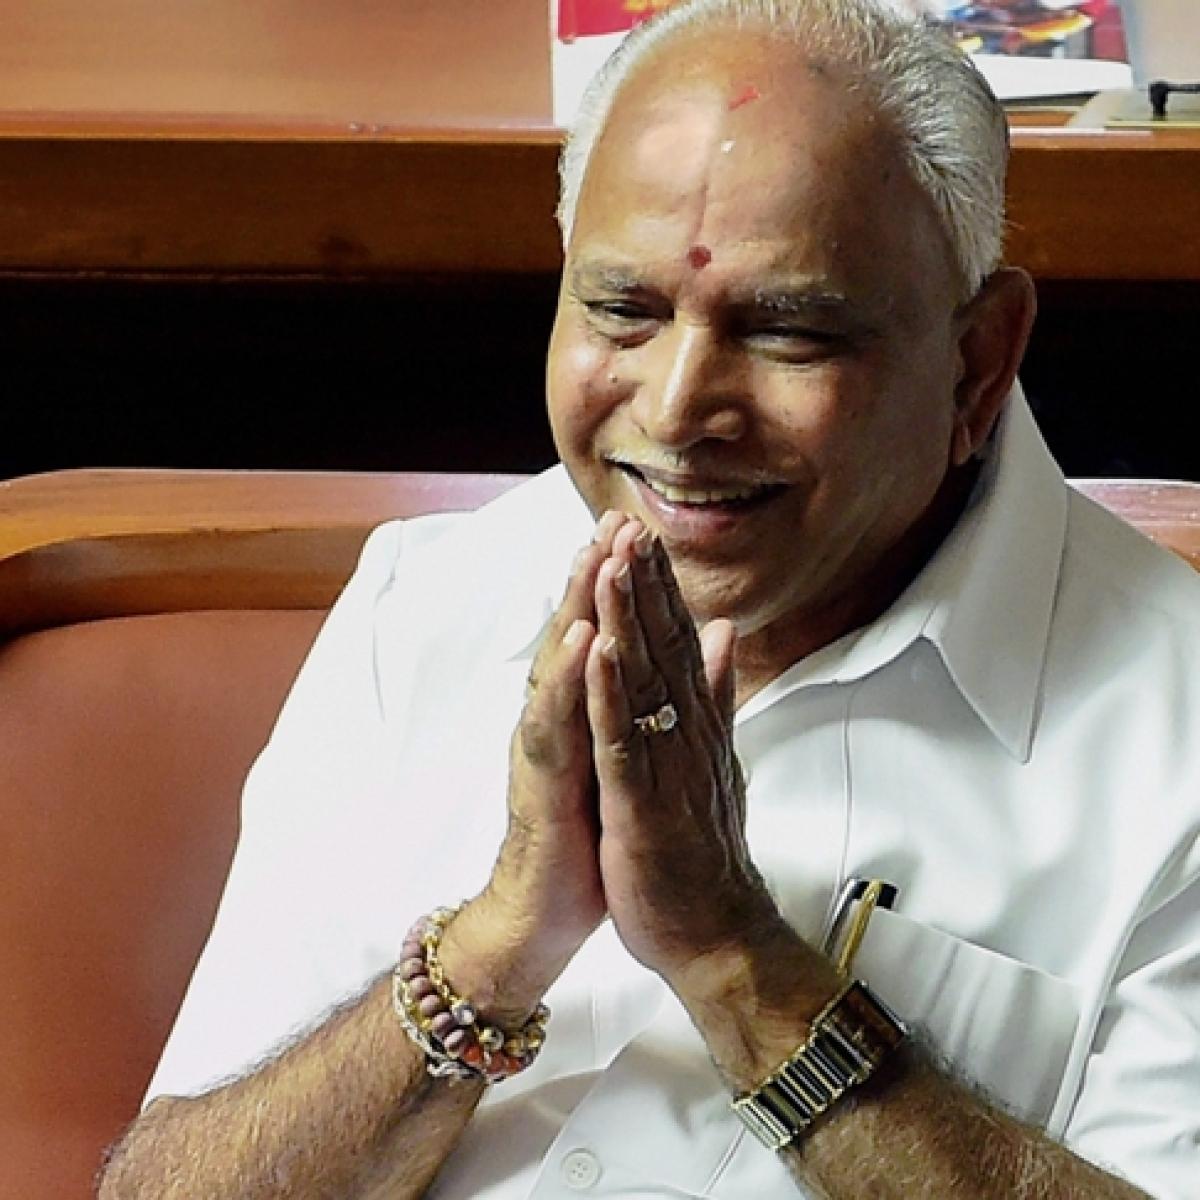 Karnataka CM BS Yediyurappa's office shut after employee tests positive for coronavirus